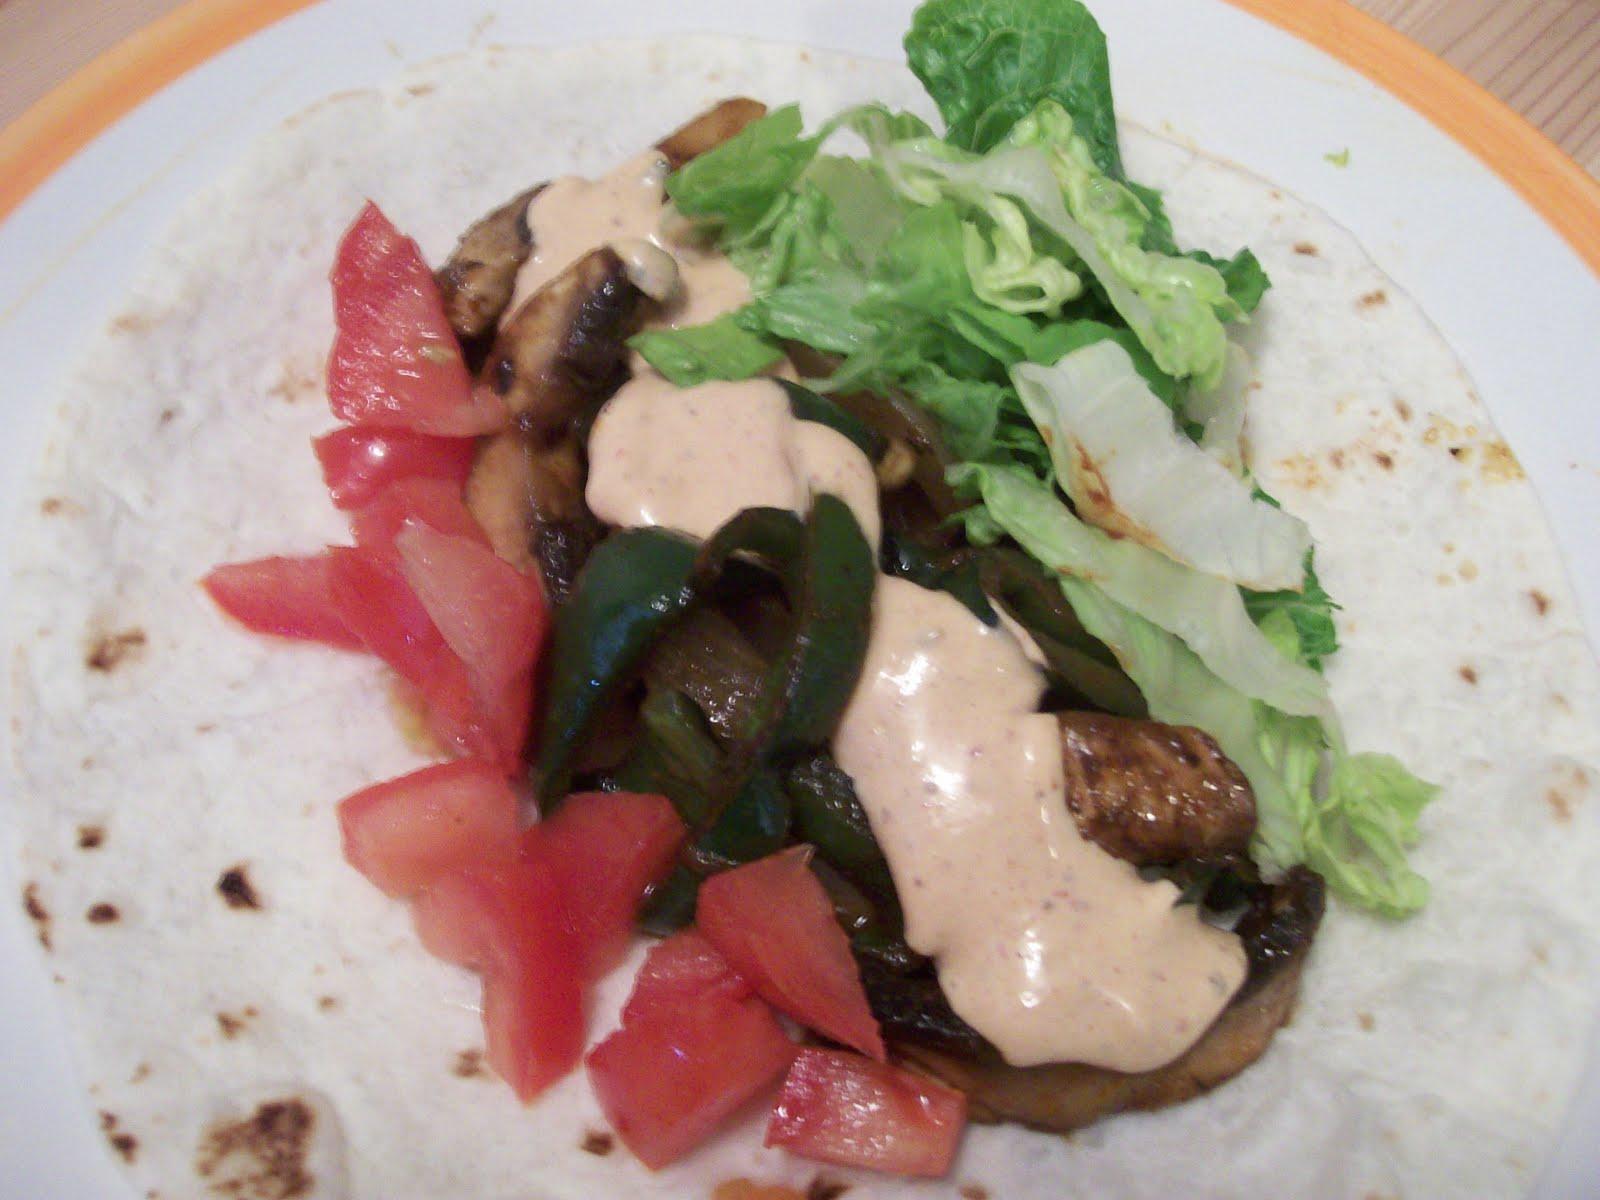 Vegan Luvies: Portobello & Poblano Tacos with Creamy Chipotle Sauce